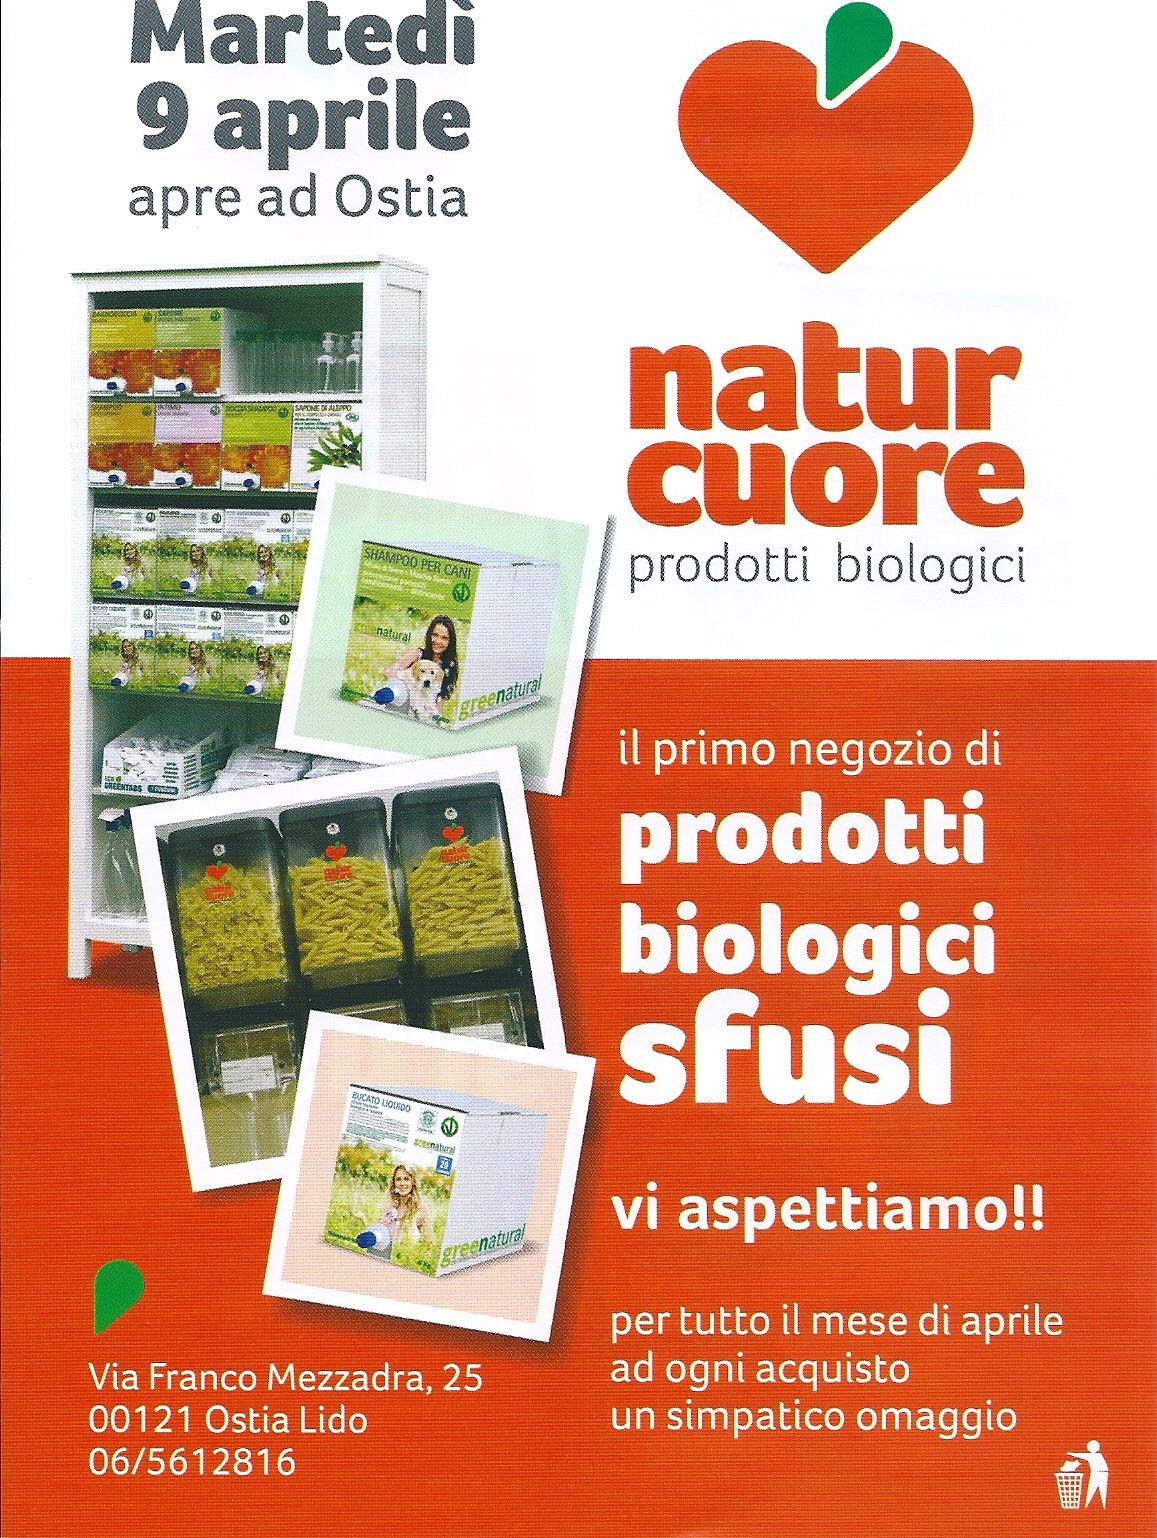 prodotti-biologici-sfusi-ostia